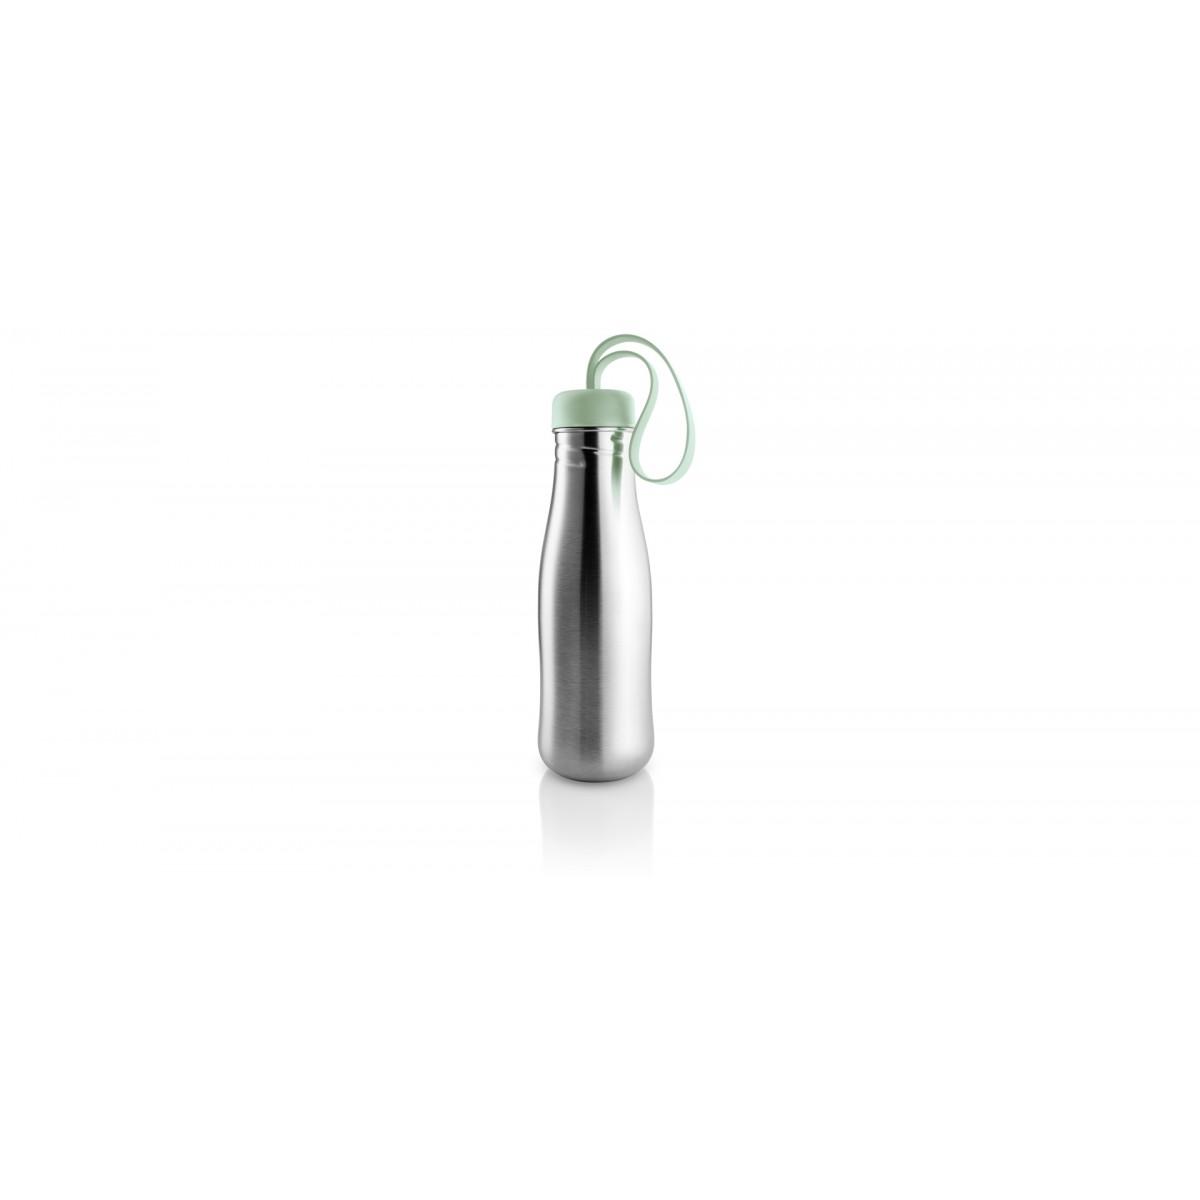 EVA SOLO Active drikkeflaske 0,7 ltr - eucalyptus green